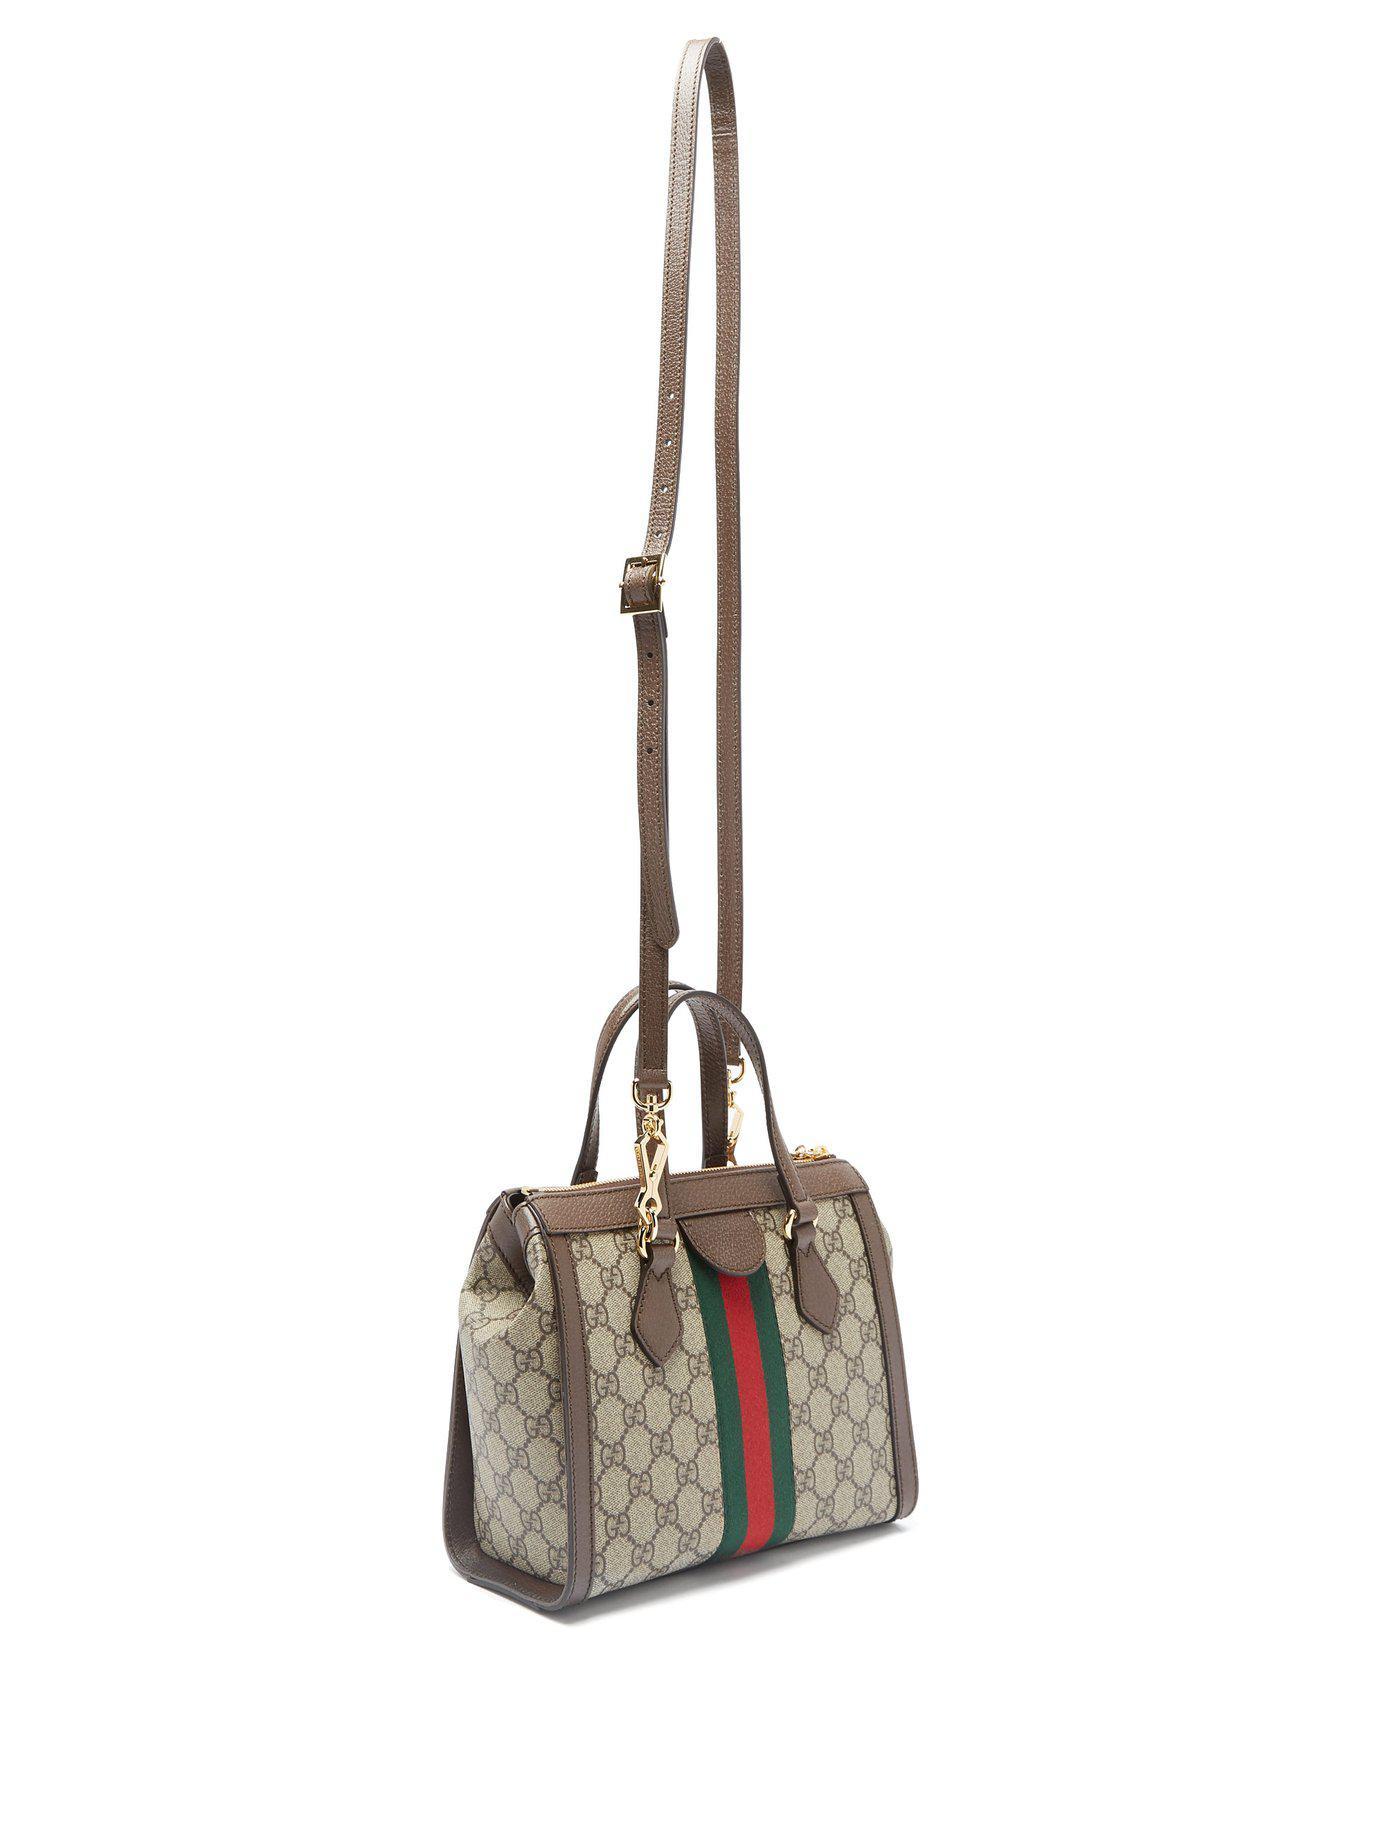 bac4d876e607 Gucci Ophidia Gg Supreme Canvas Cross Body Bag in Gray - Lyst